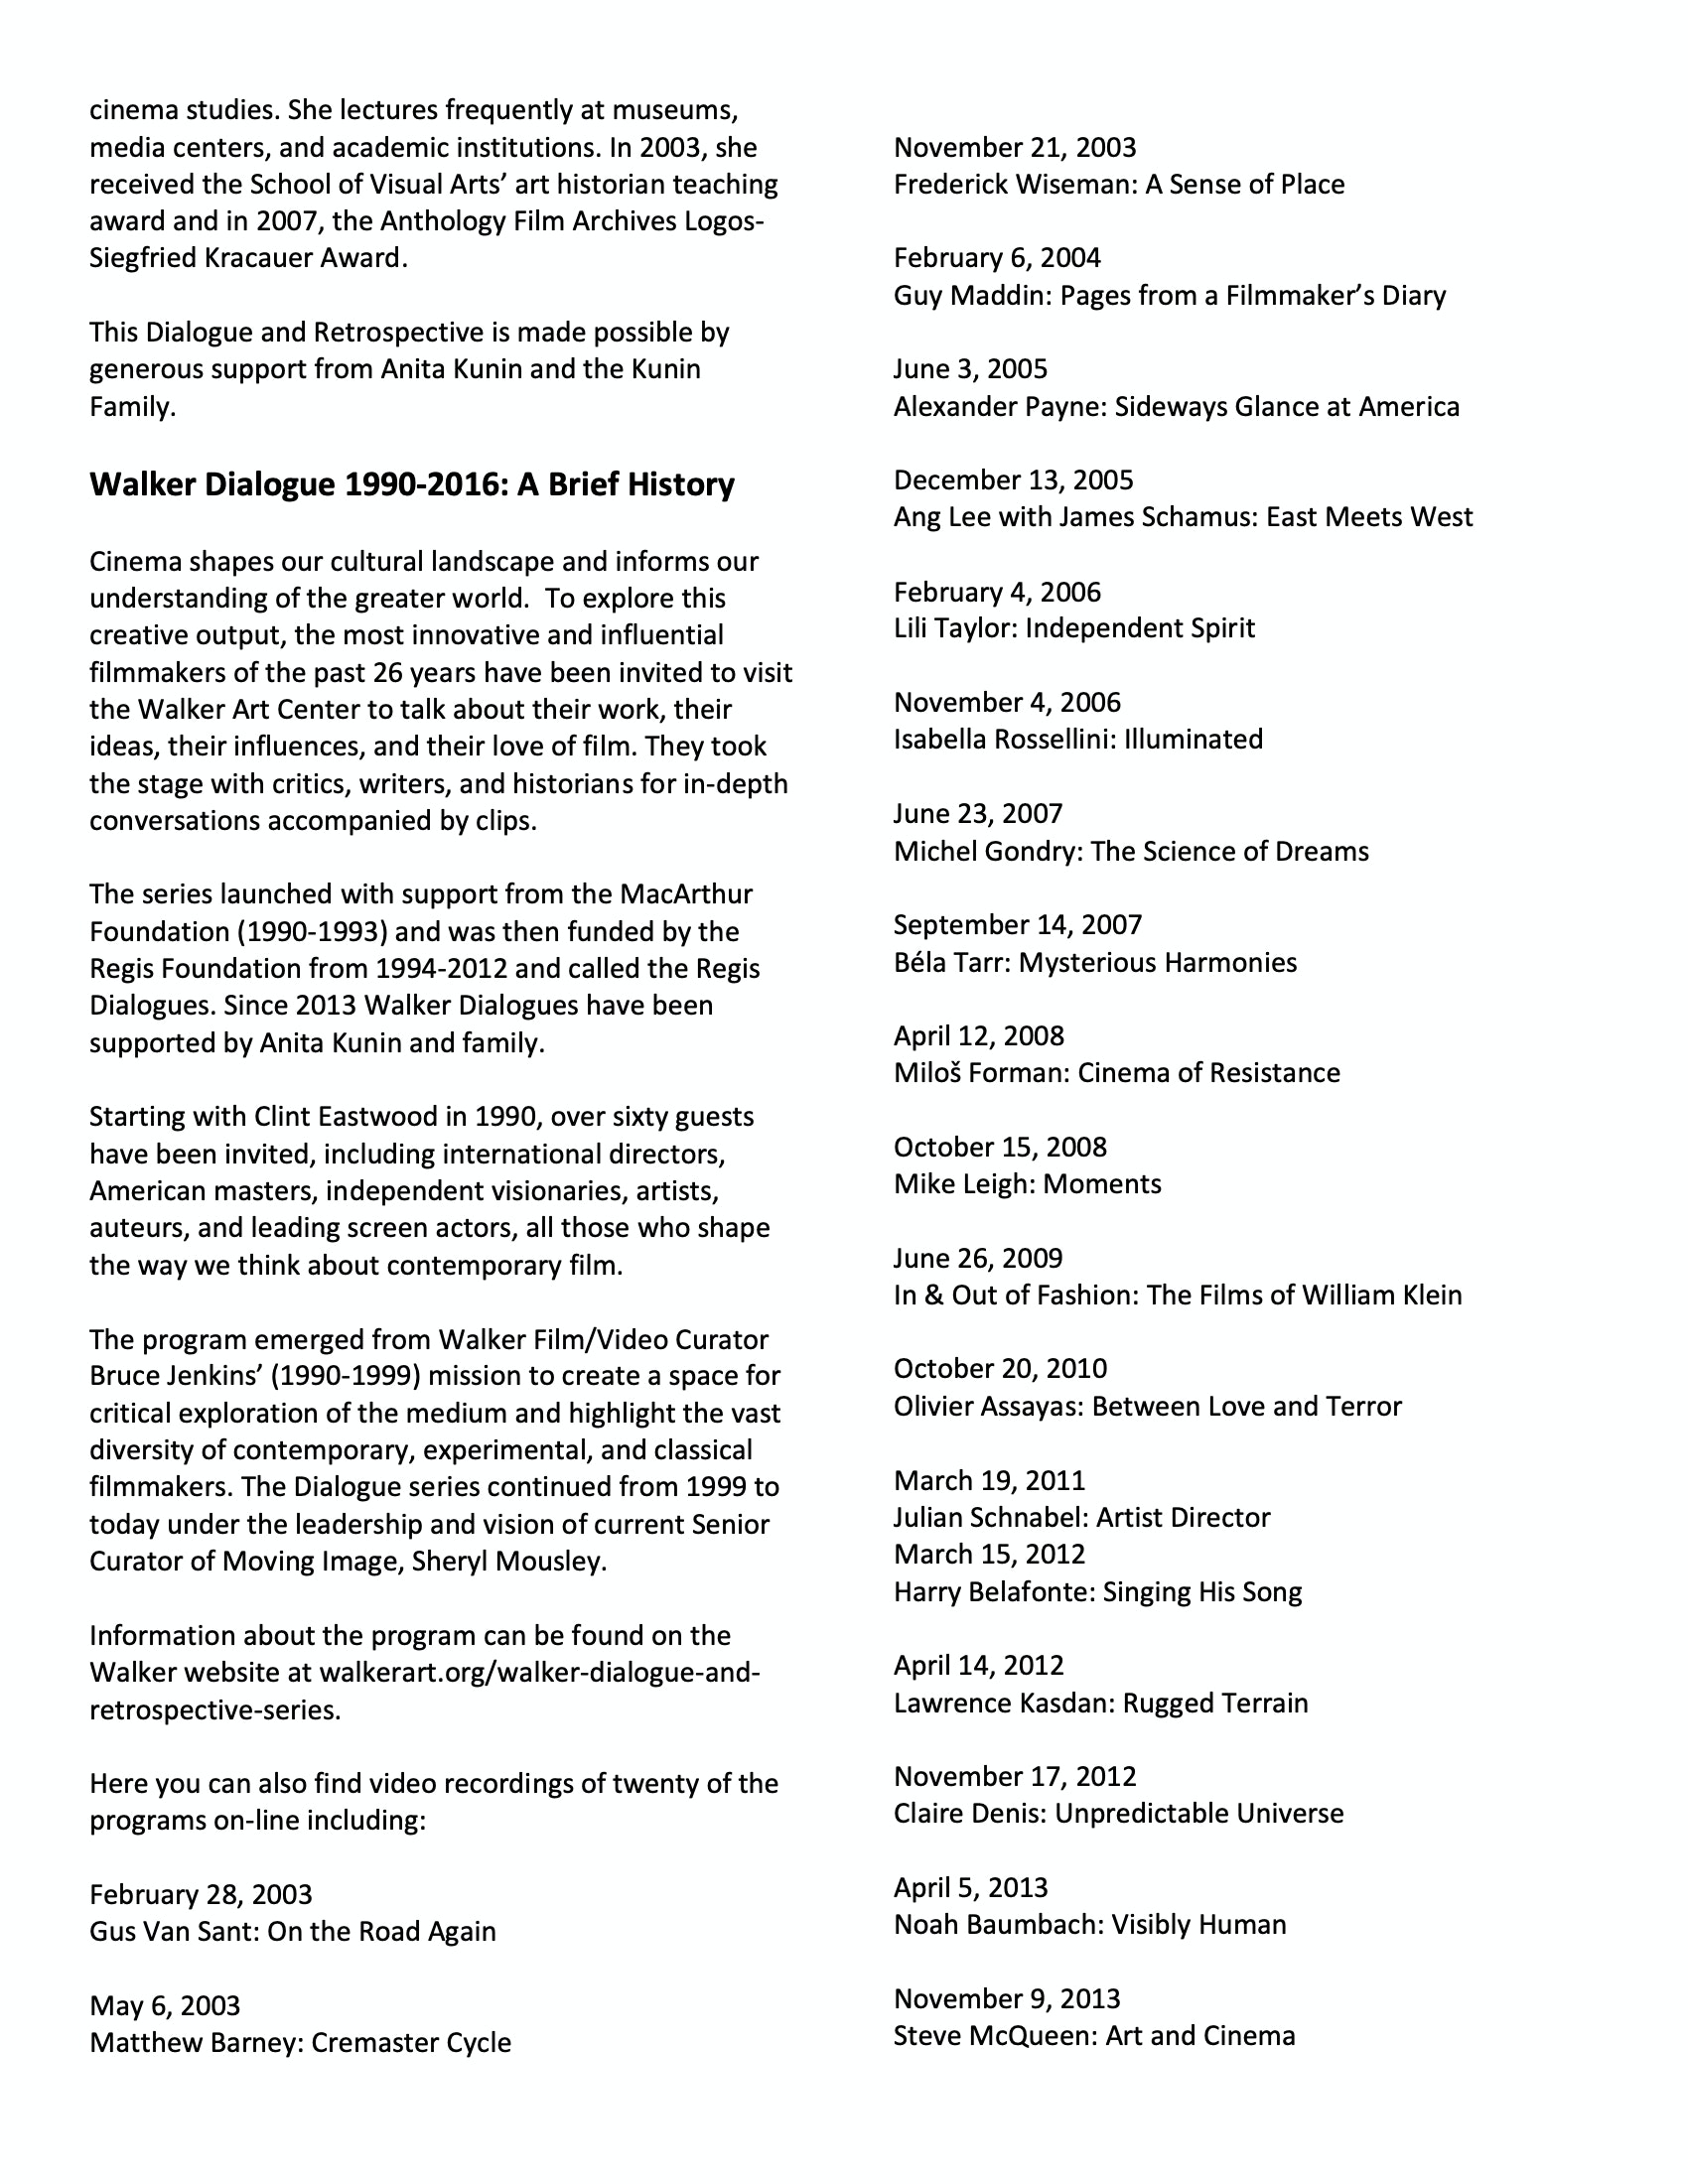 Robert Redford program notes pg 5